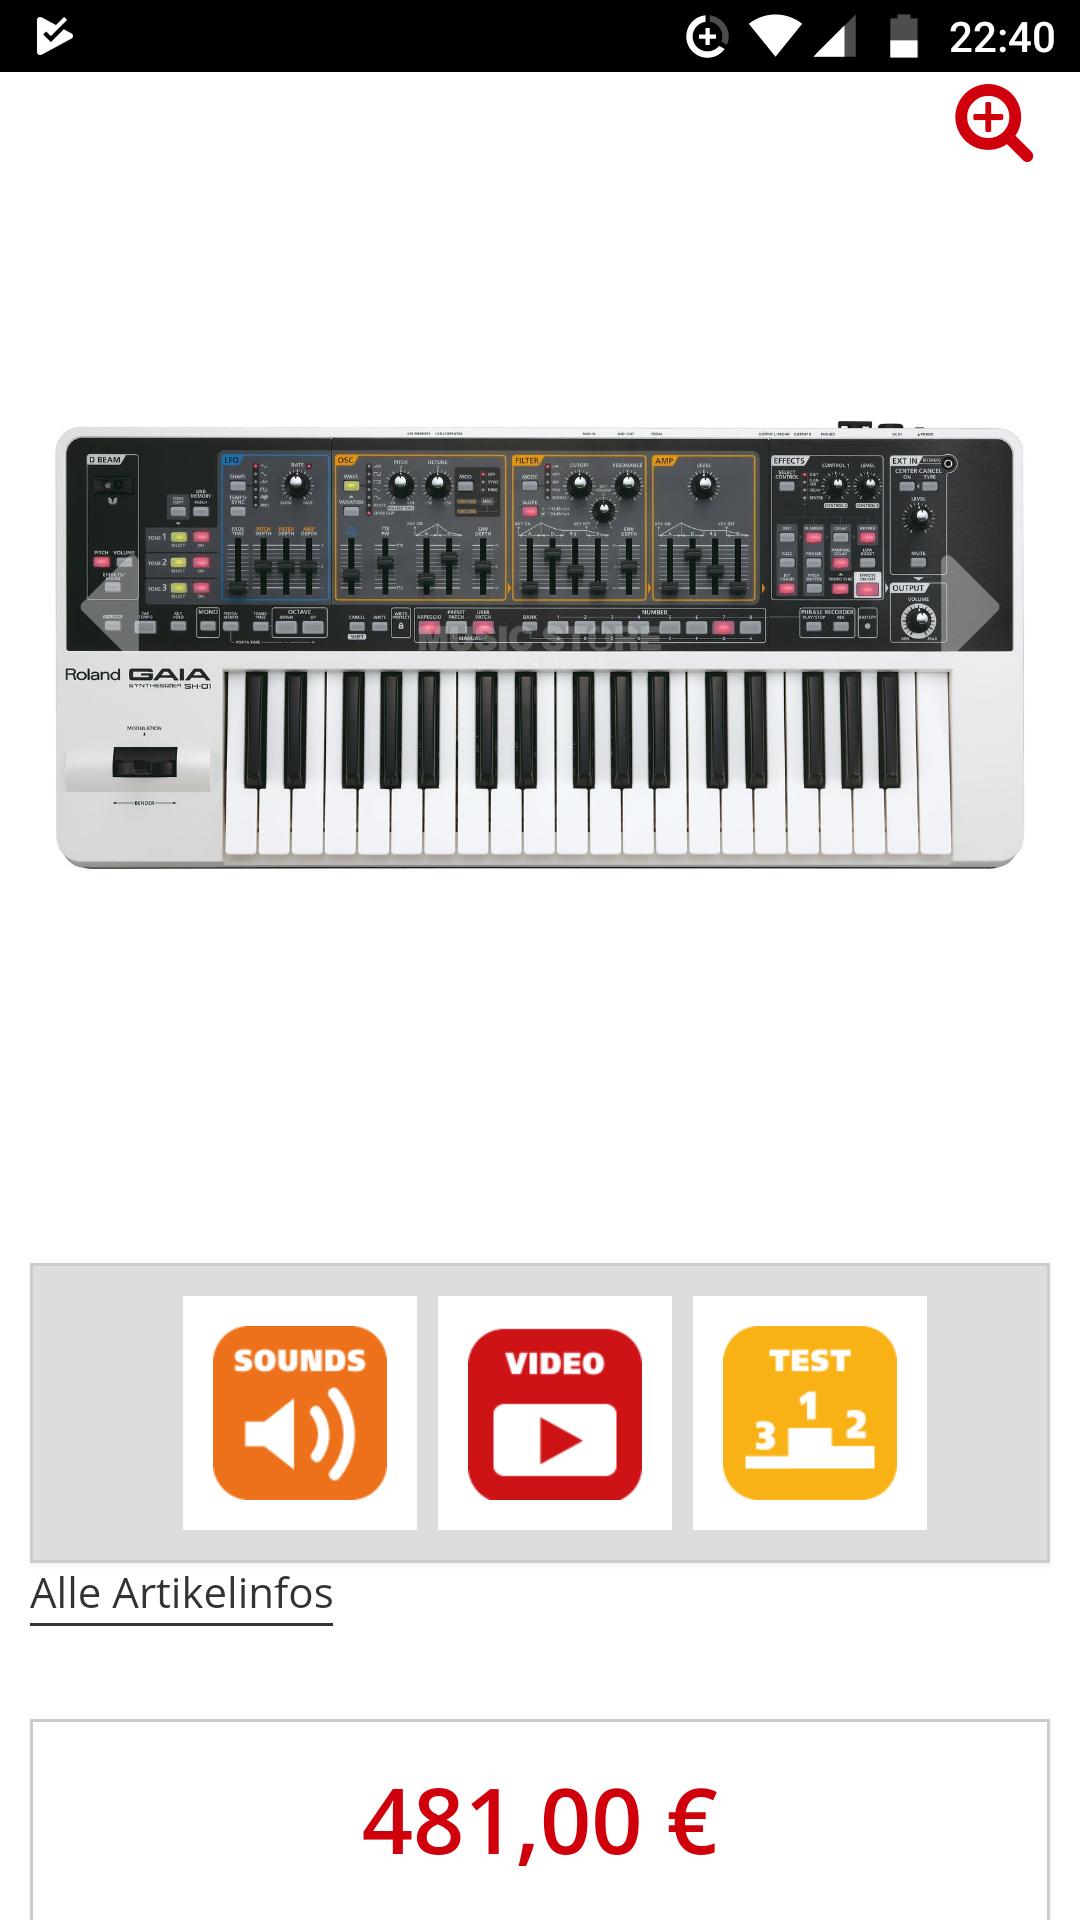 RolandGAIA SH-01 Synthesizer  @ MusicStore